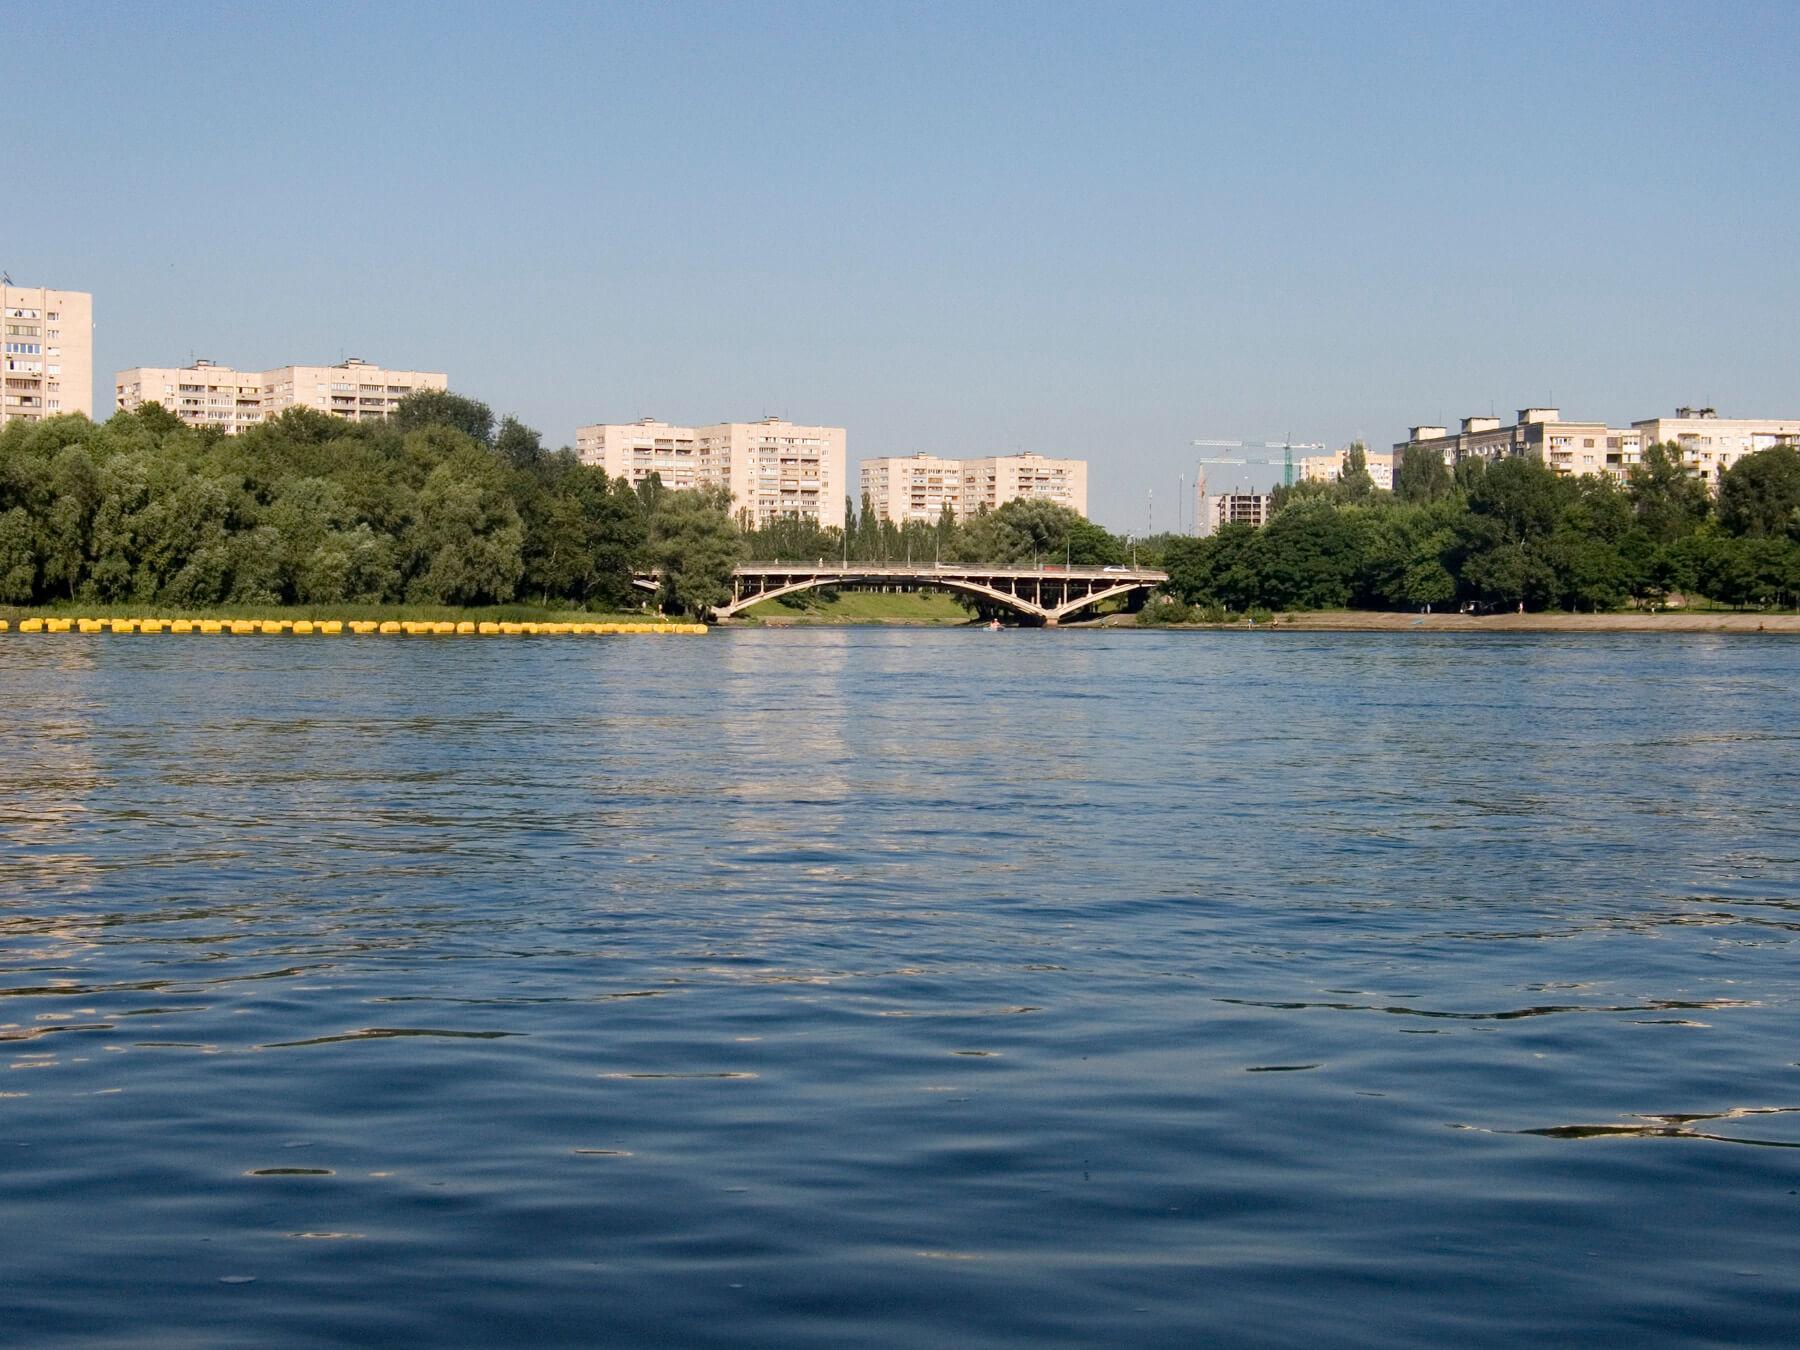 Днепровский район Киева - Русановка